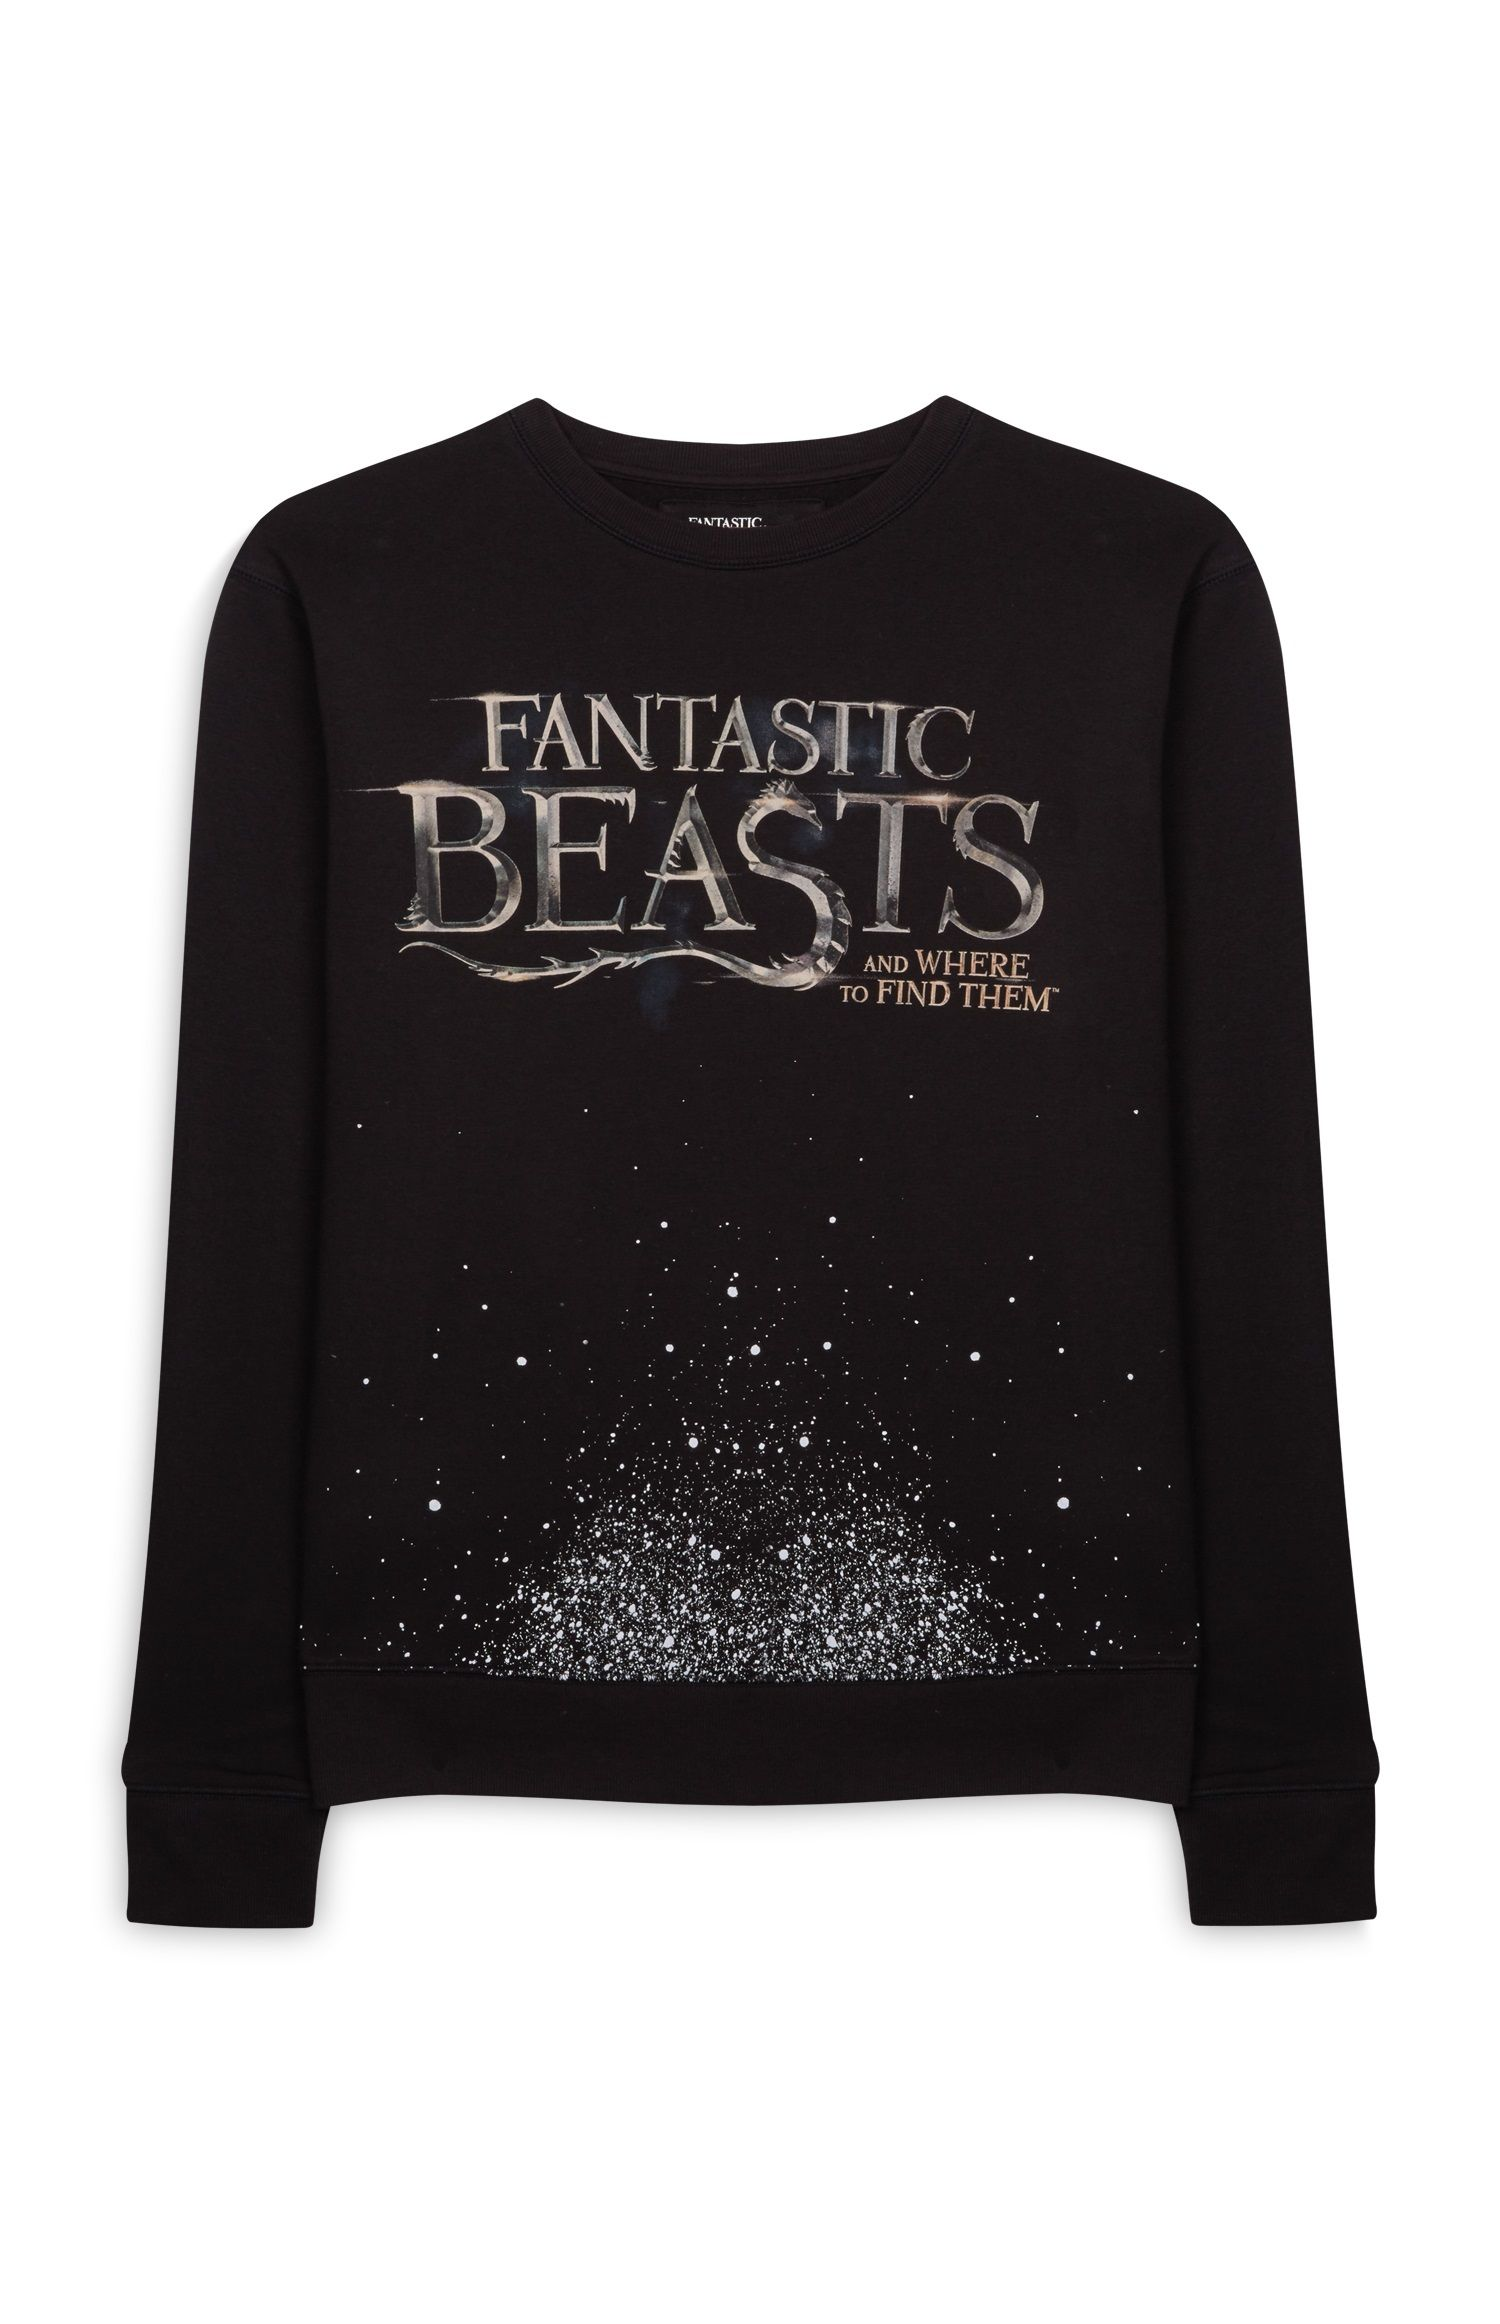 ed1dd3ebe Primark - Fantastic Beasts Sweater | Wizard World in 2019 ...